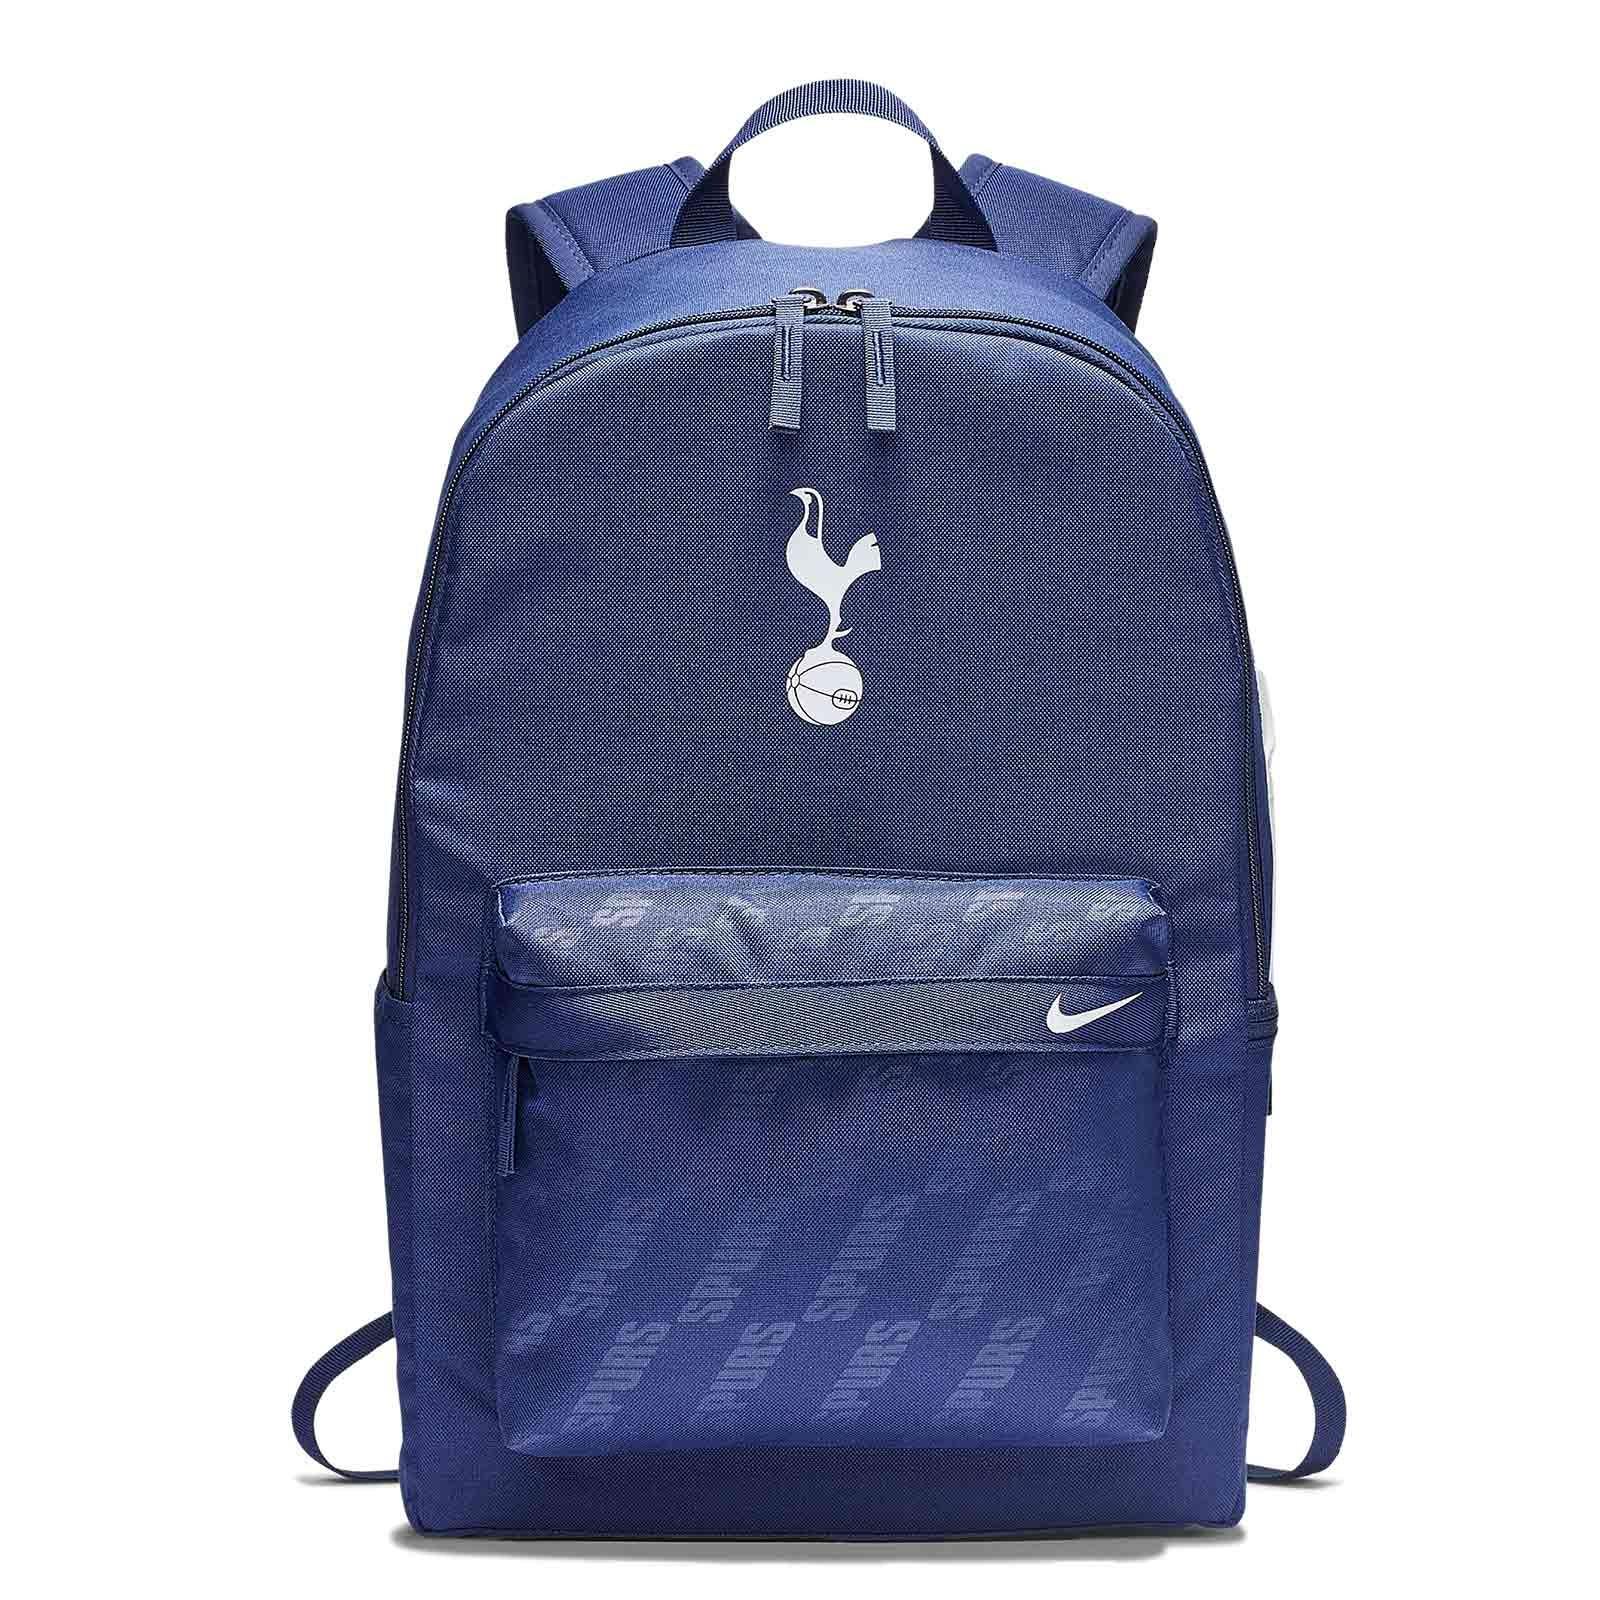 Hong Kong masilla Drástico  Mochila Nike Tottenham Stadium 19 20 marino | futbolmania